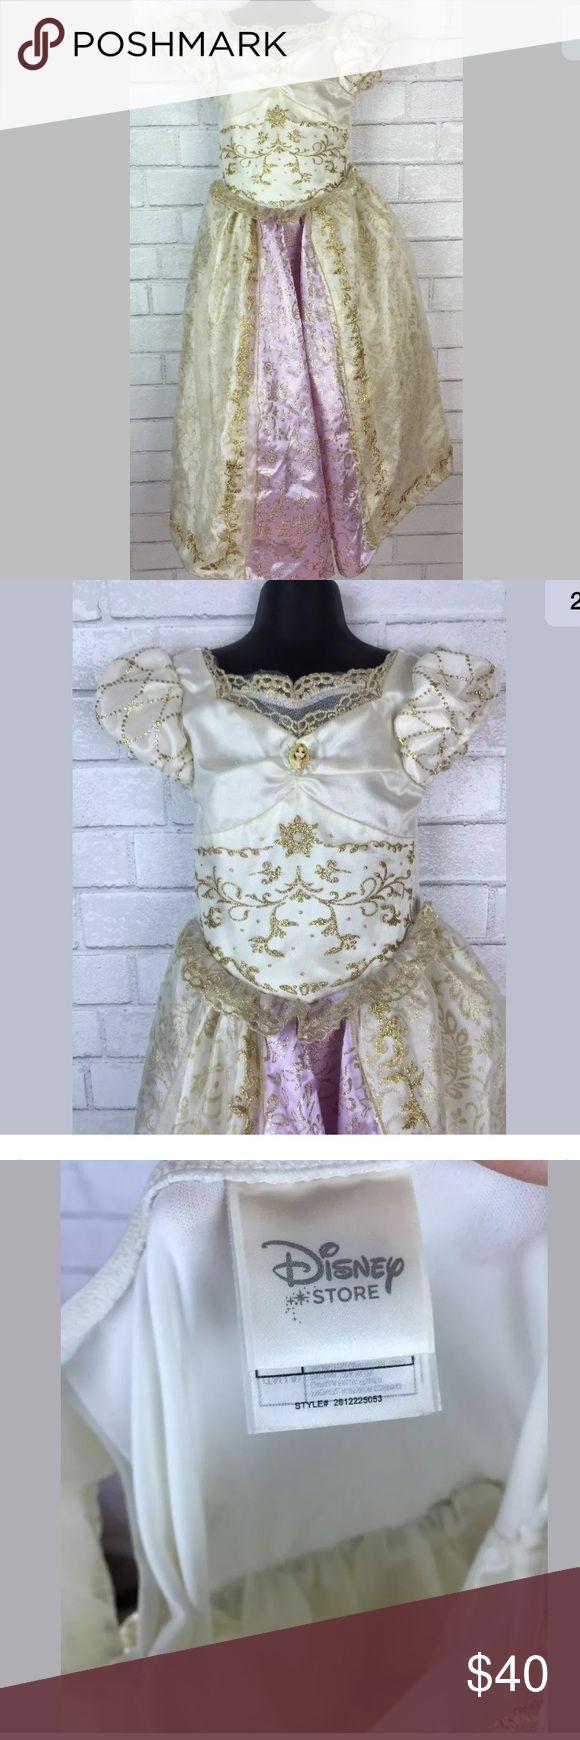 Dresses skirts clothes women disney store - Disney Store Rapunzel Wedding Dress Costume